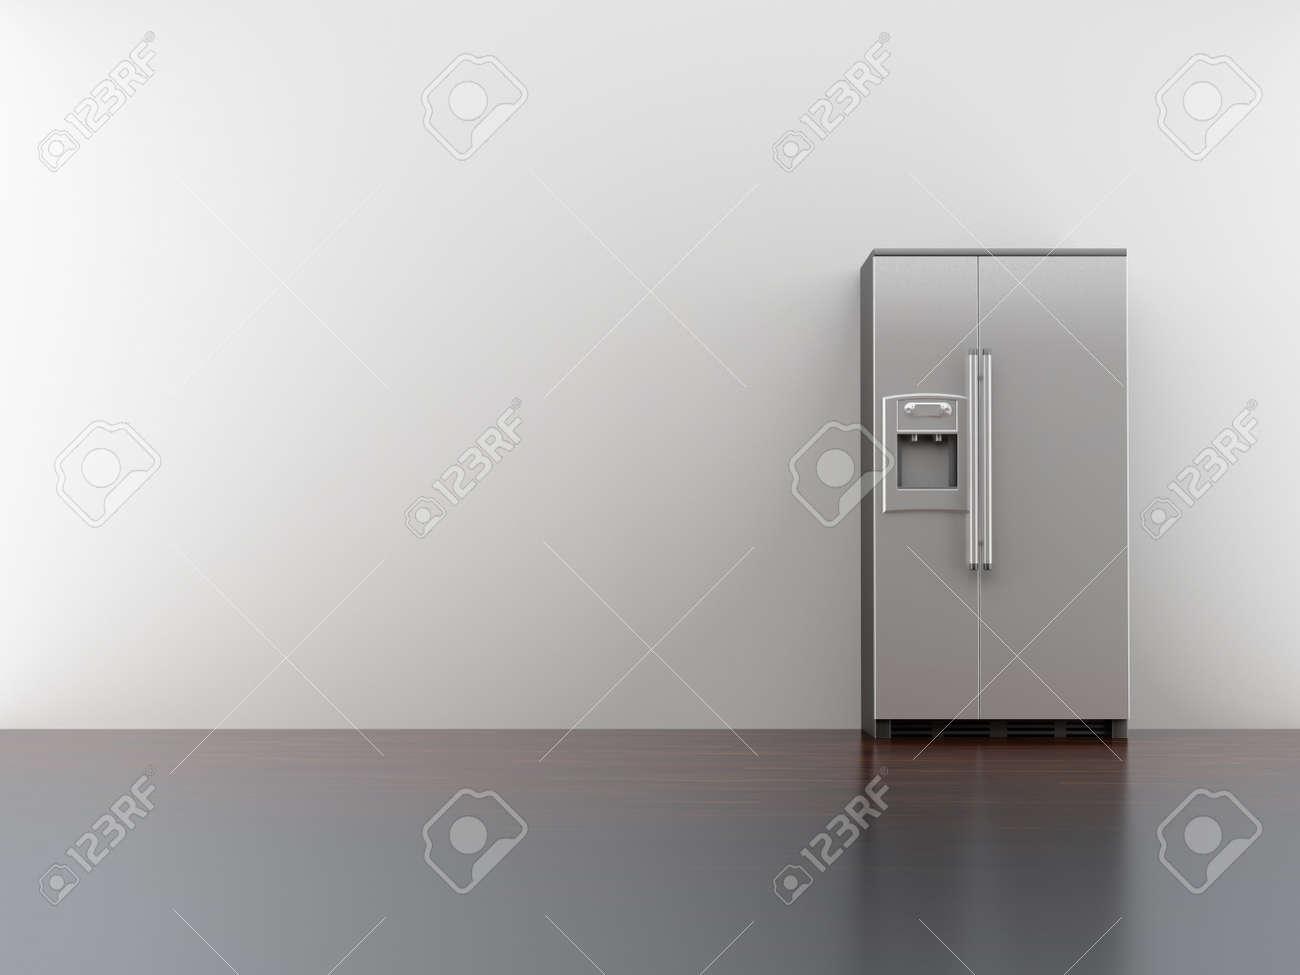 fridge on blank white wall - 5958429